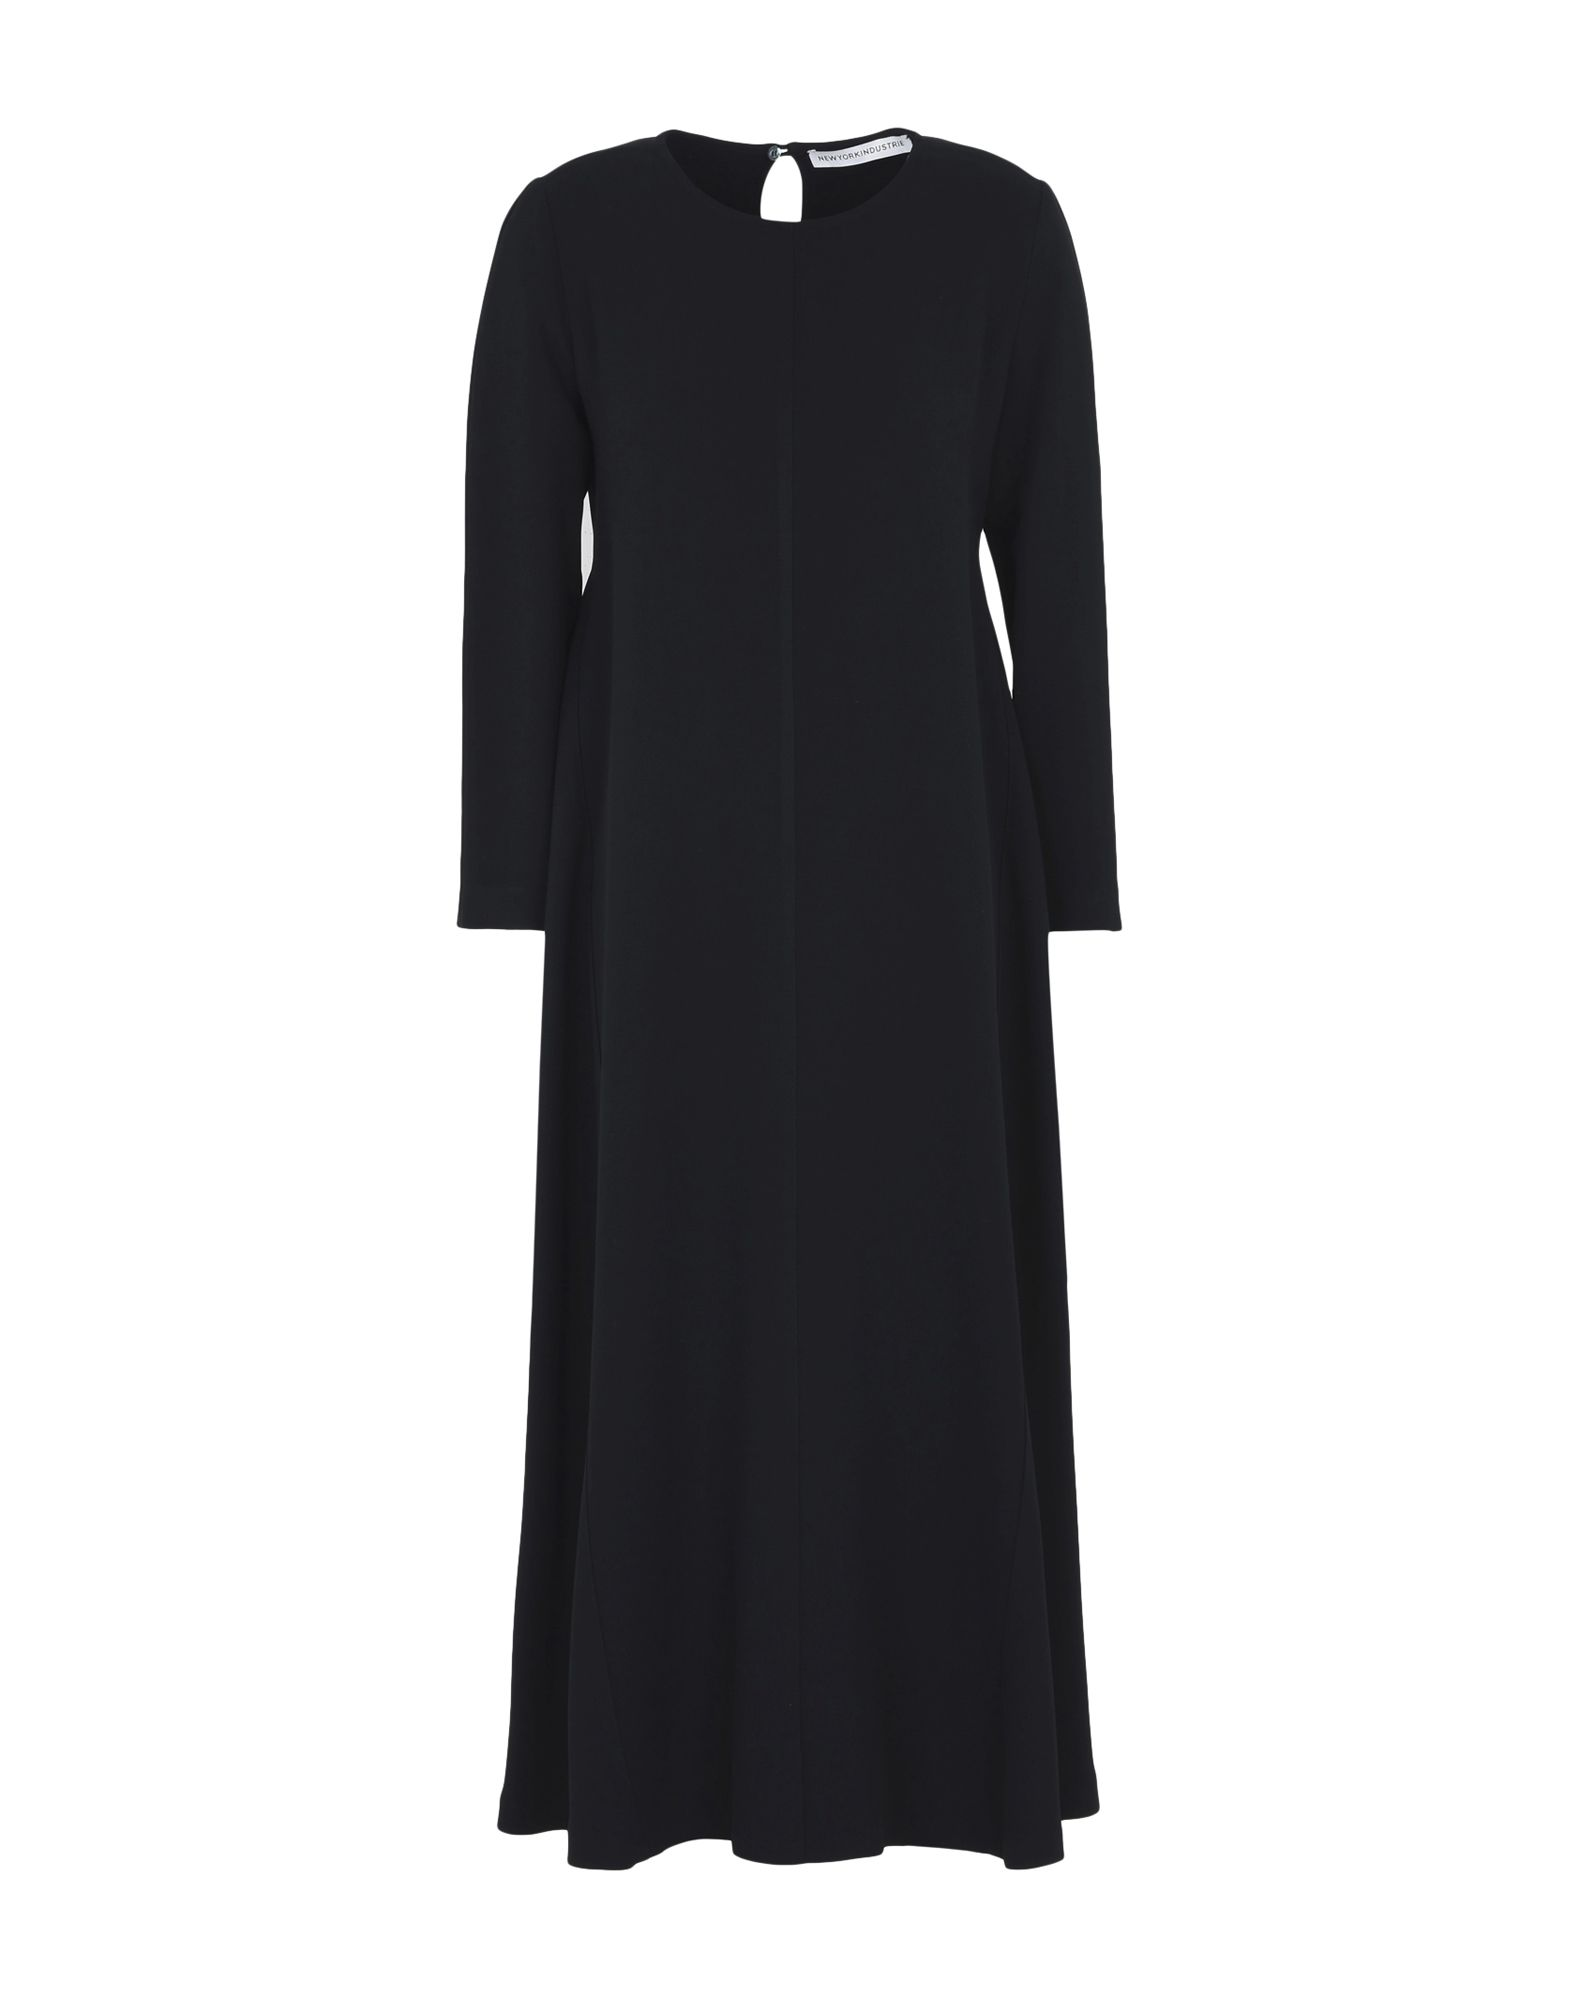 NEW YORK INDUSTRIE Платье длиной 3/4 new york industrie платье длиной 3 4